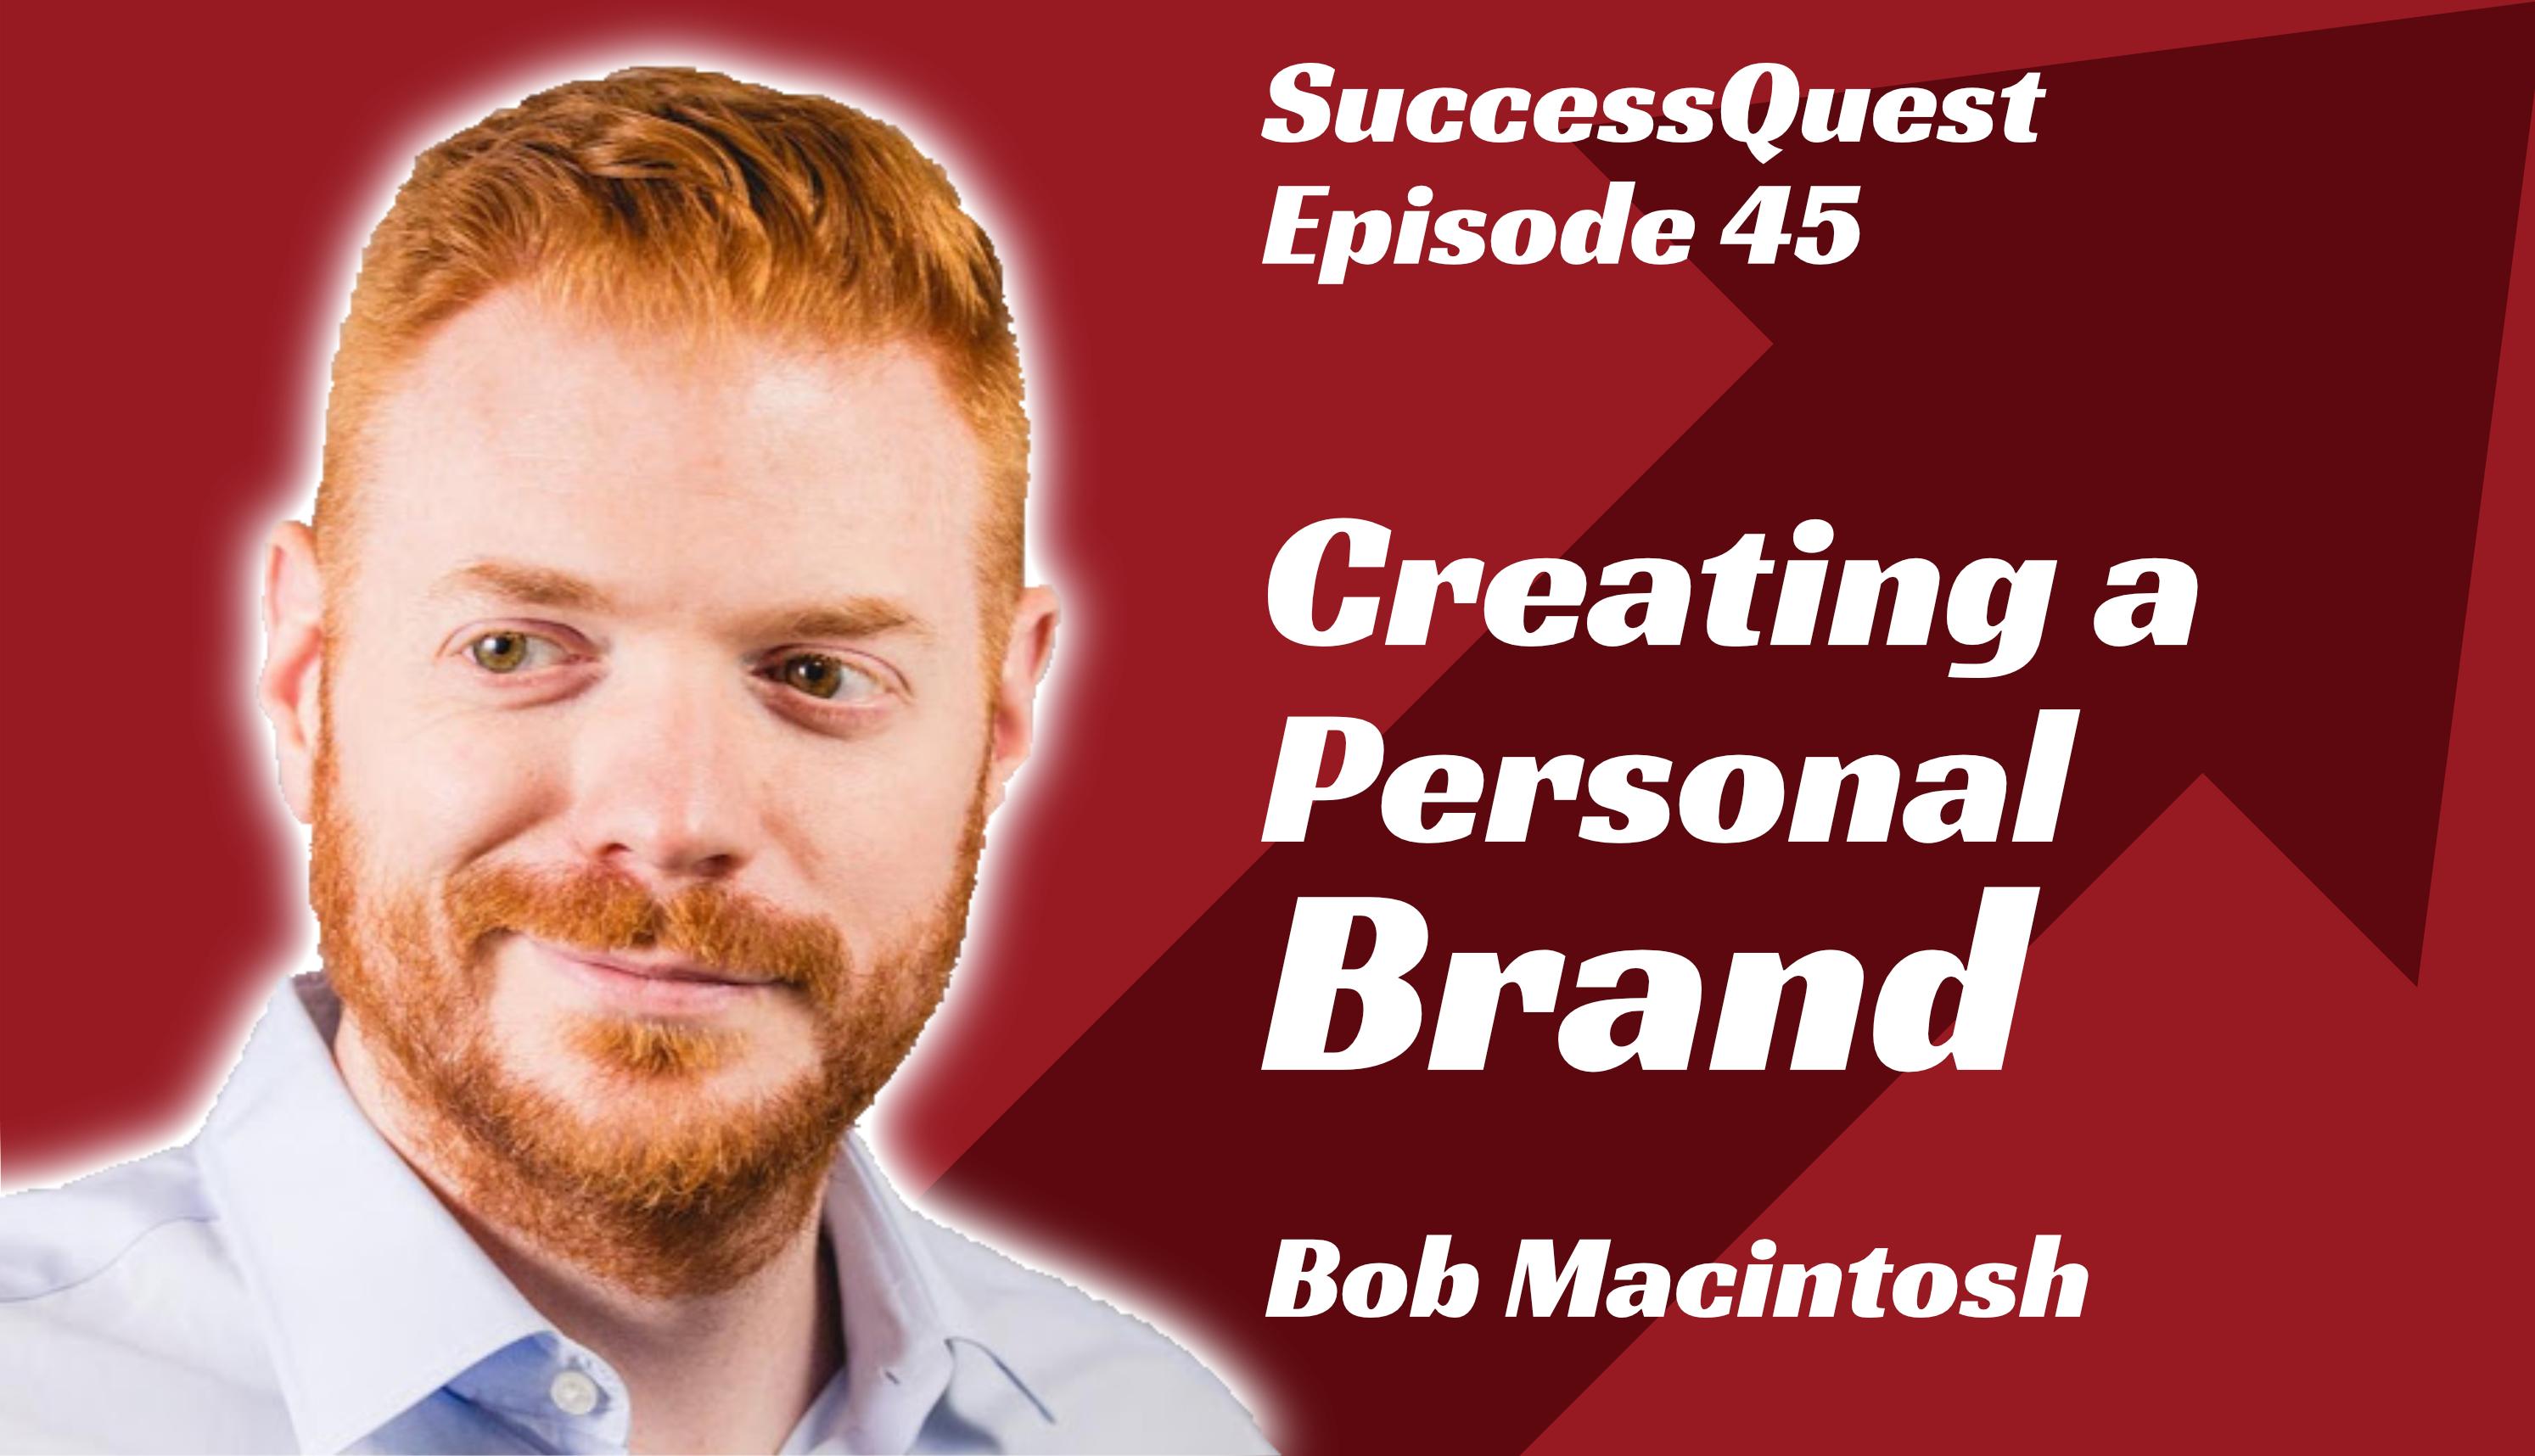 Bob Macintosh Creating a Personal Brand SuccessQuest